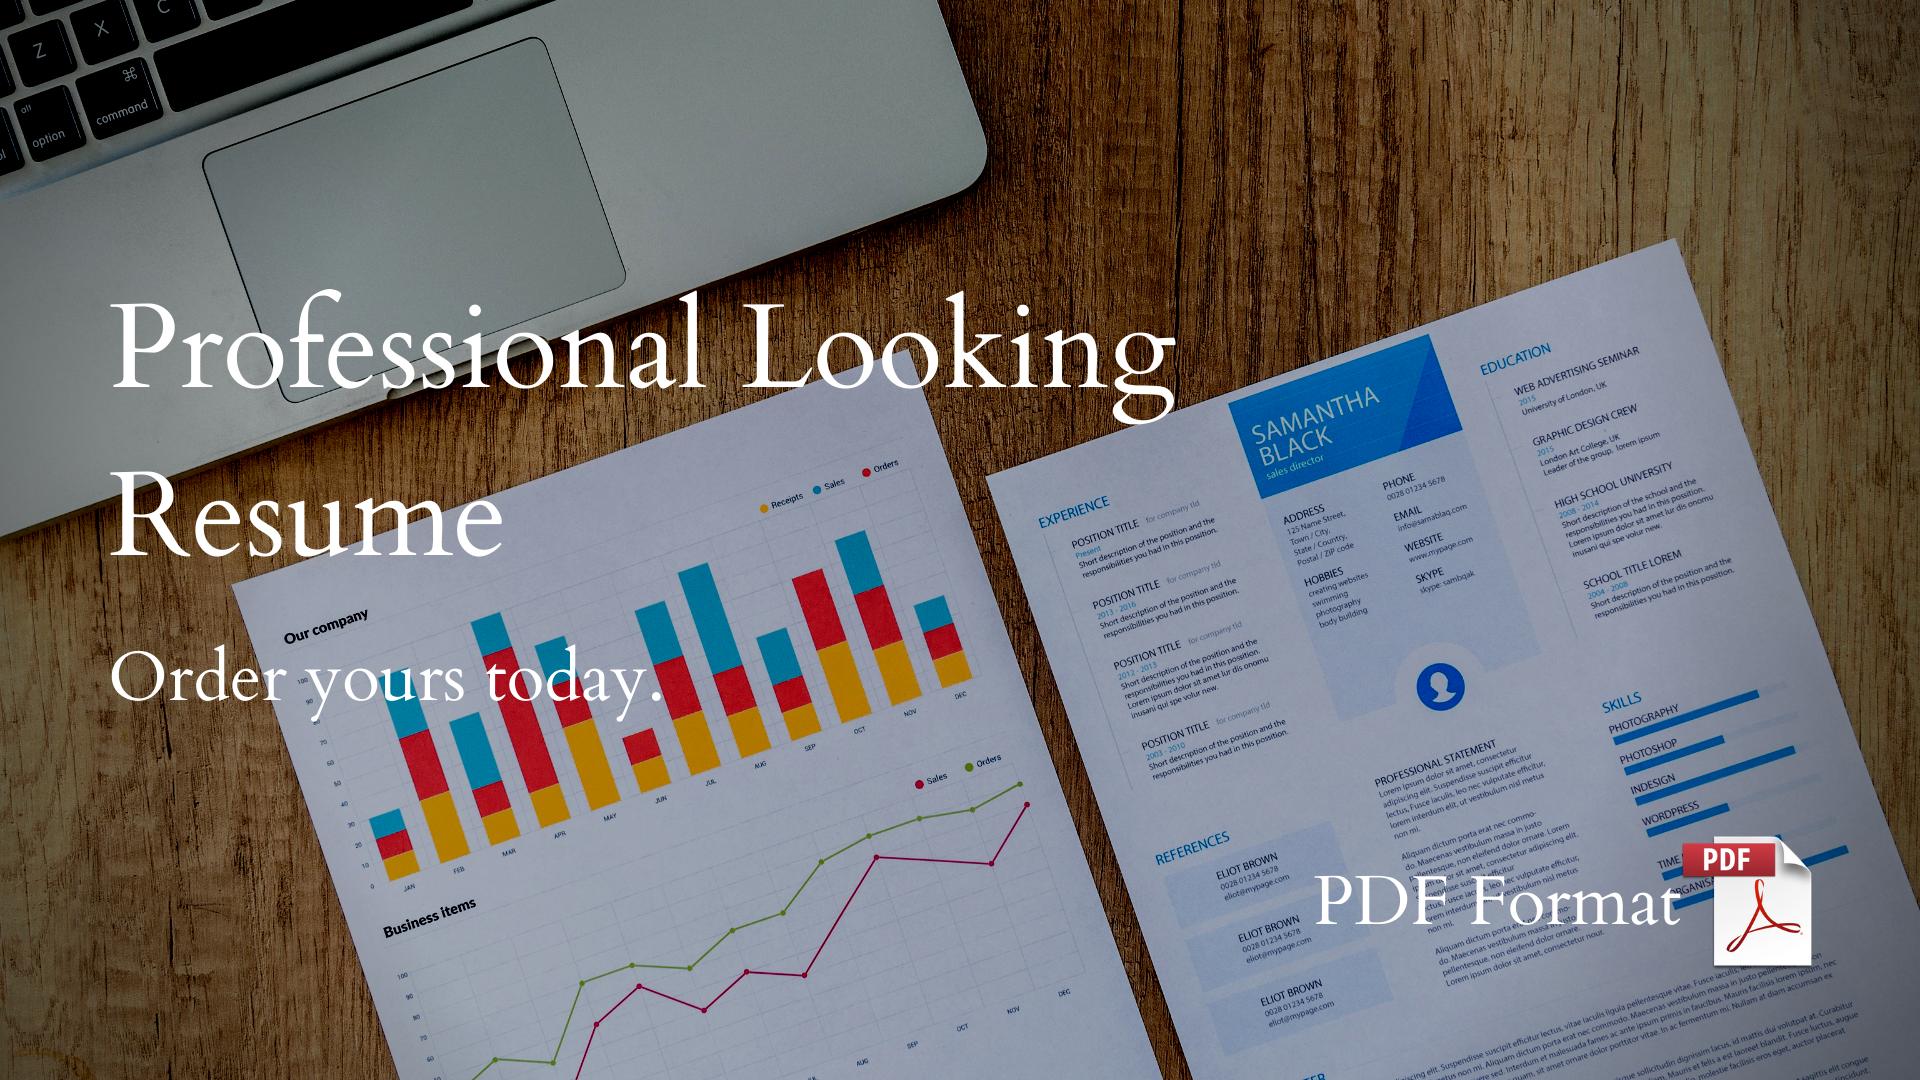 Professional Looking Resume Design